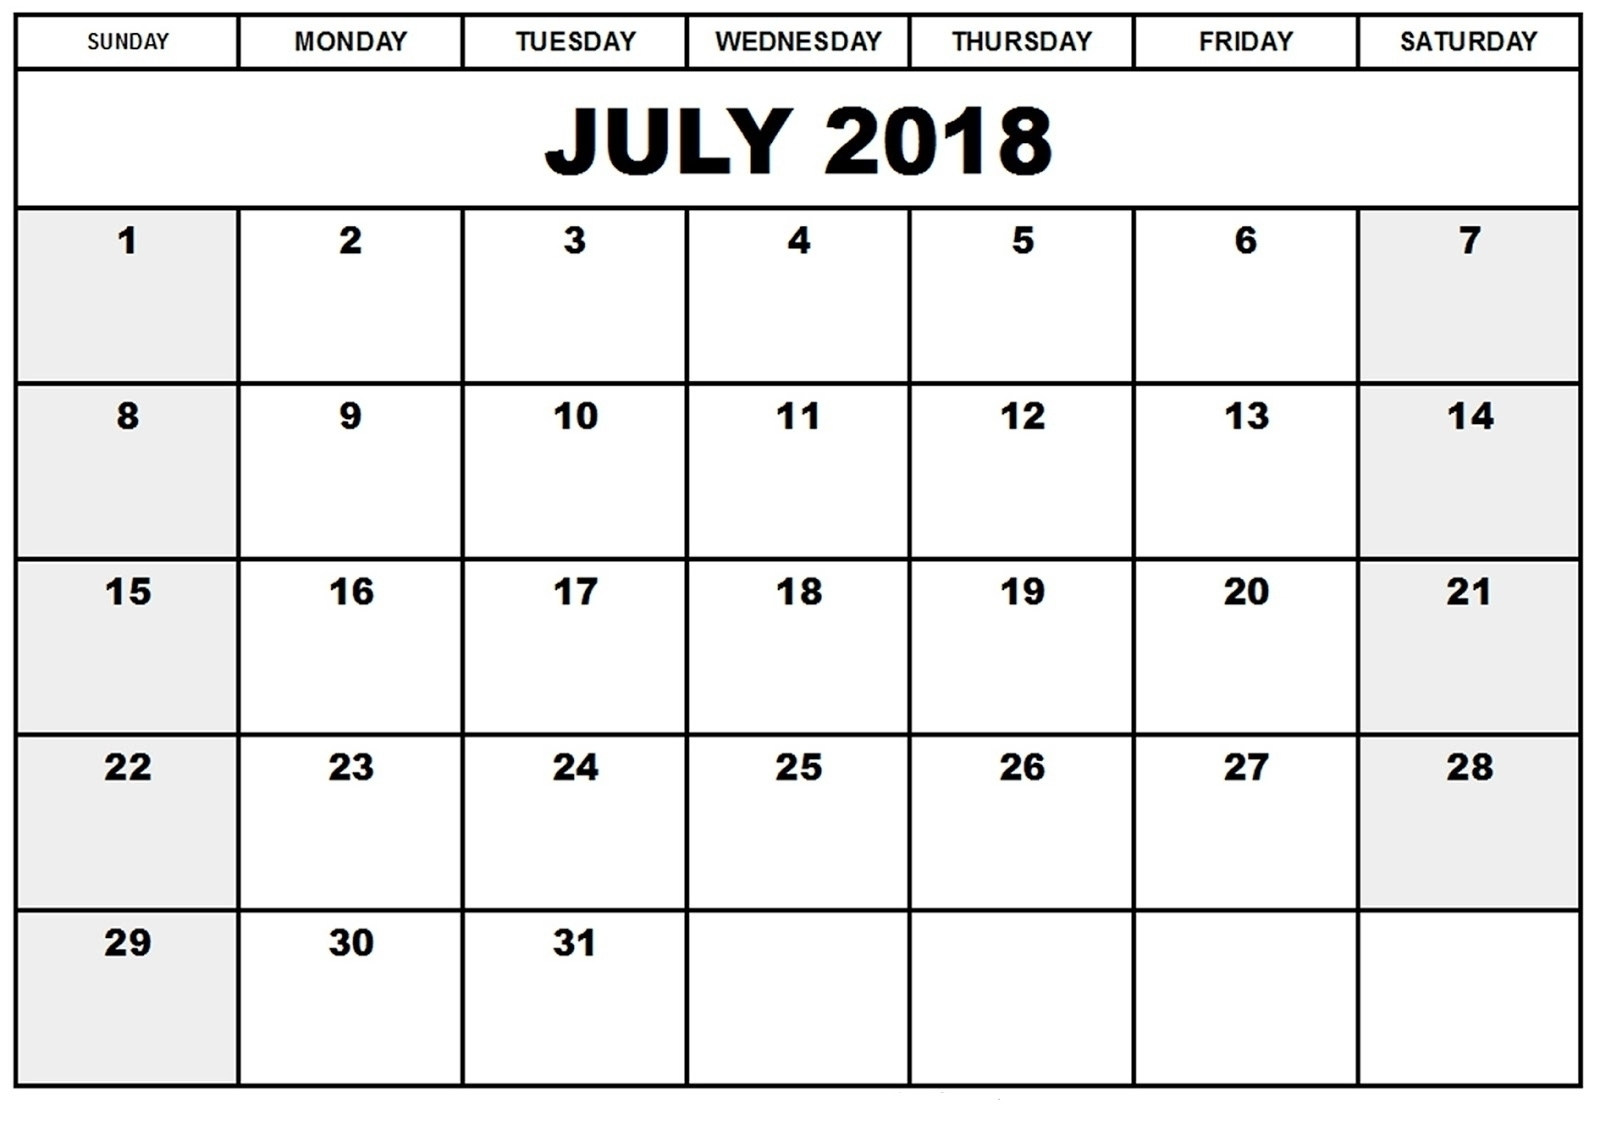 4X6 Blank Monthly Calendar Template | Template Calendar Printable with regard to 4X6 Blank Monthly Calendar Template